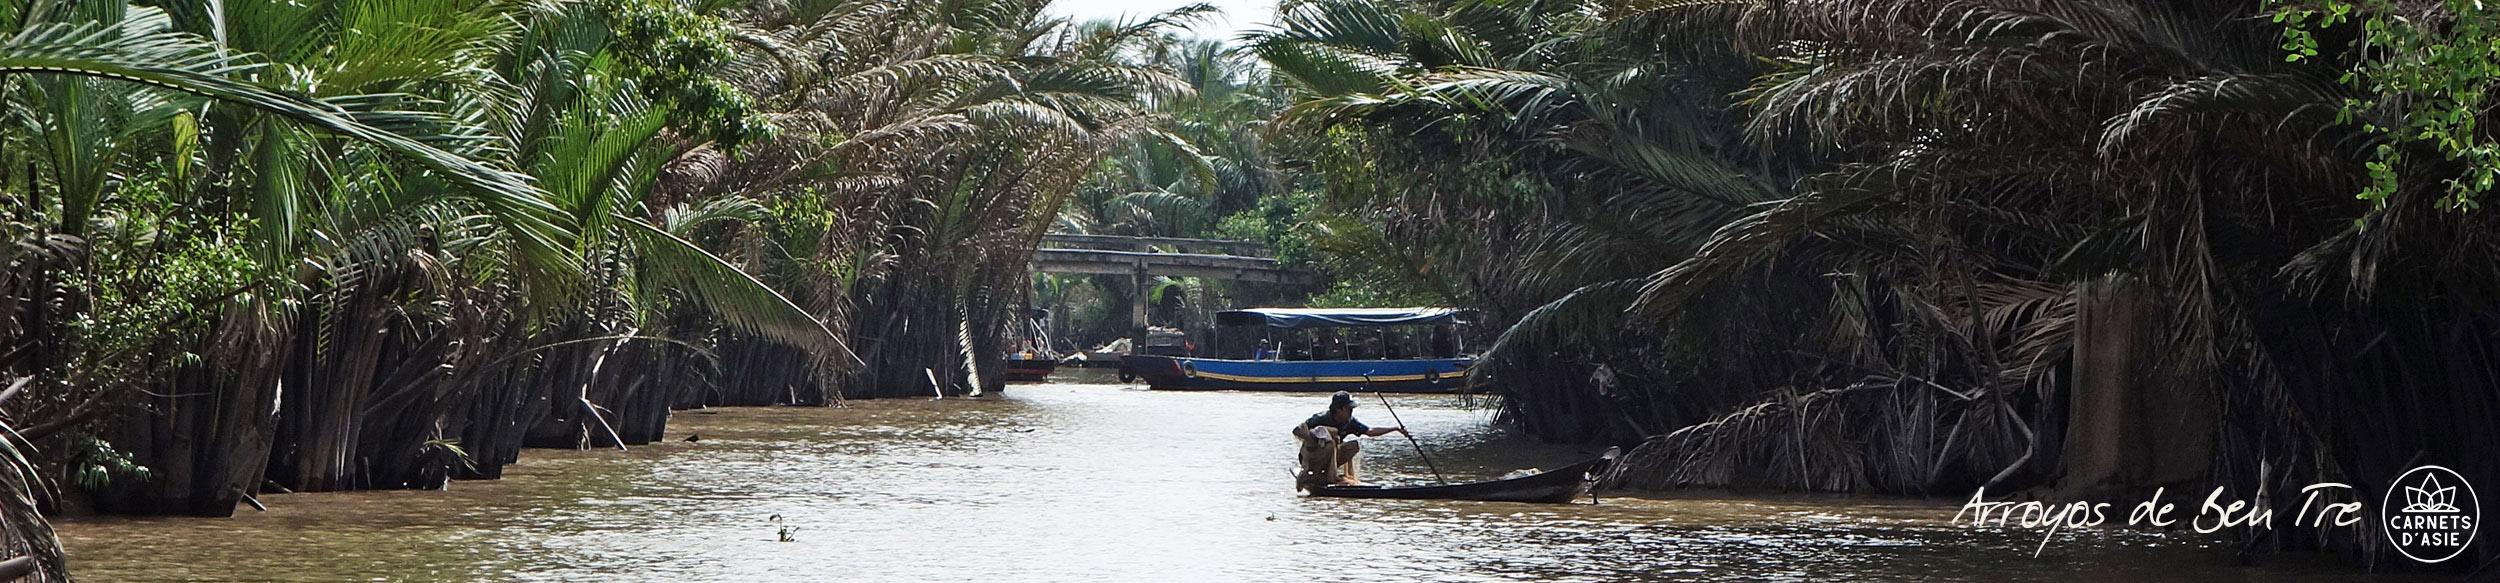 Pêcheur dans la mangrove de Ben Tre